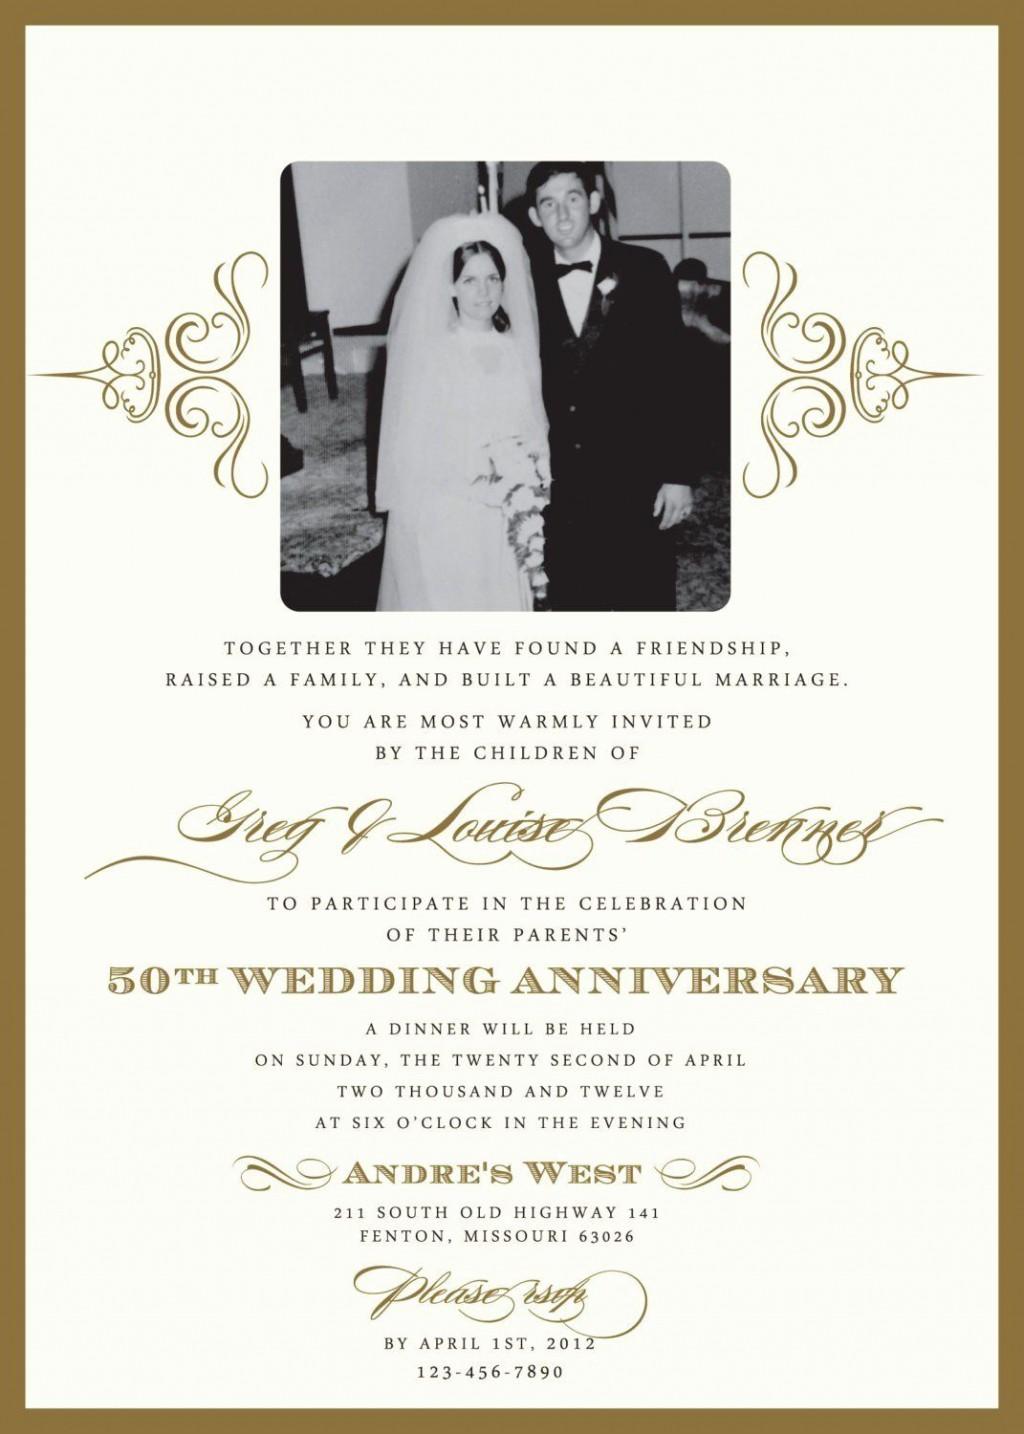 003 Sensational 50th Anniversary Party Invitation Template Photo  Templates Golden Wedding Uk Microsoft Word FreeLarge